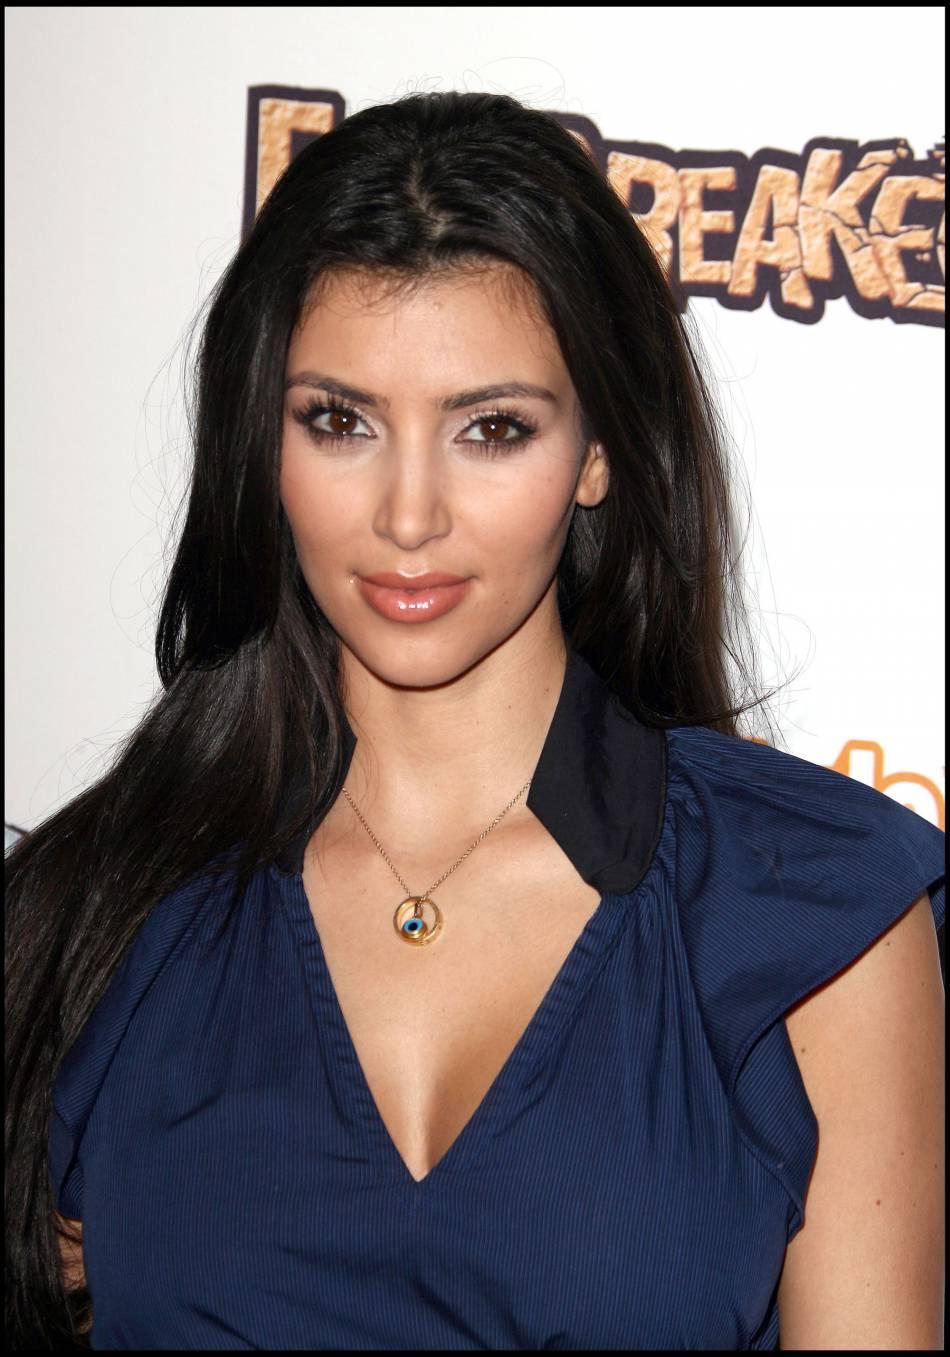 Kim Kardashian n'a plus du tout cette tête, ni cette implantation de cheveux.